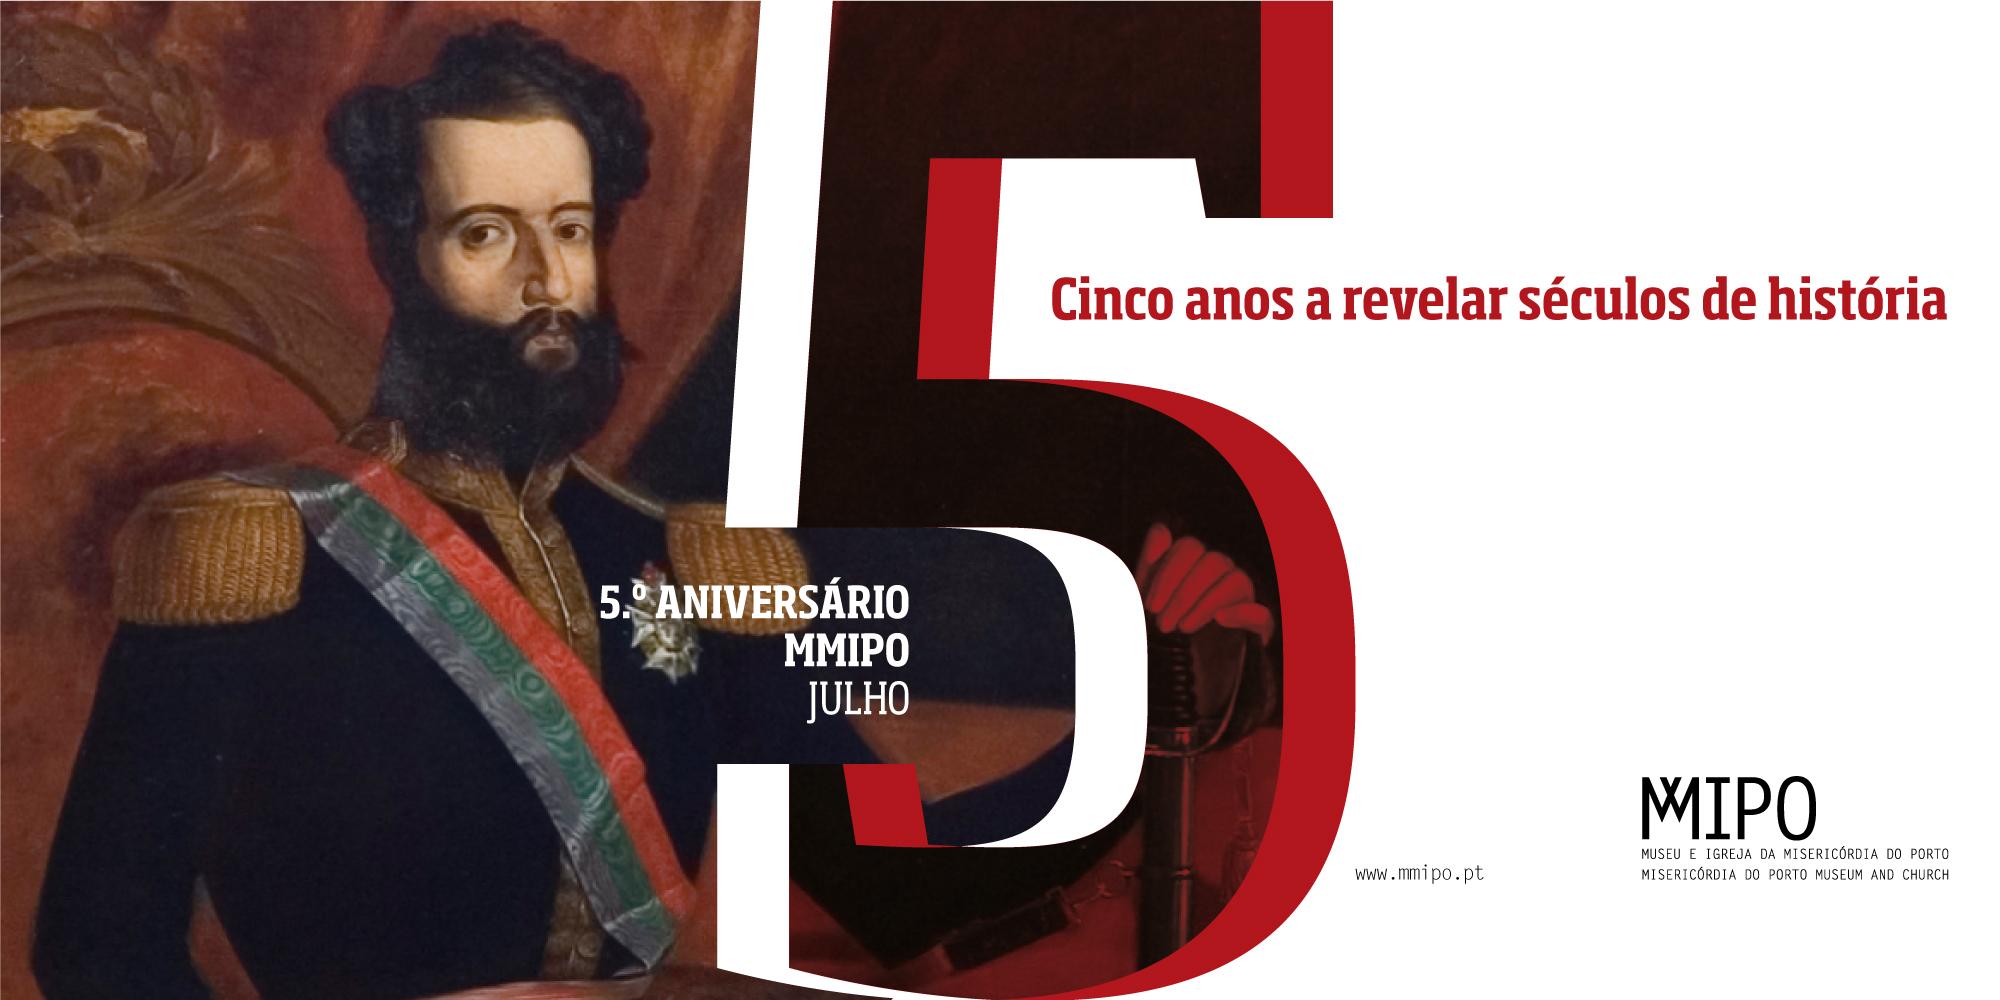 http://www.mmipo.pt/assets/misc/atividades/M-5aniversario-bannersite.jpg